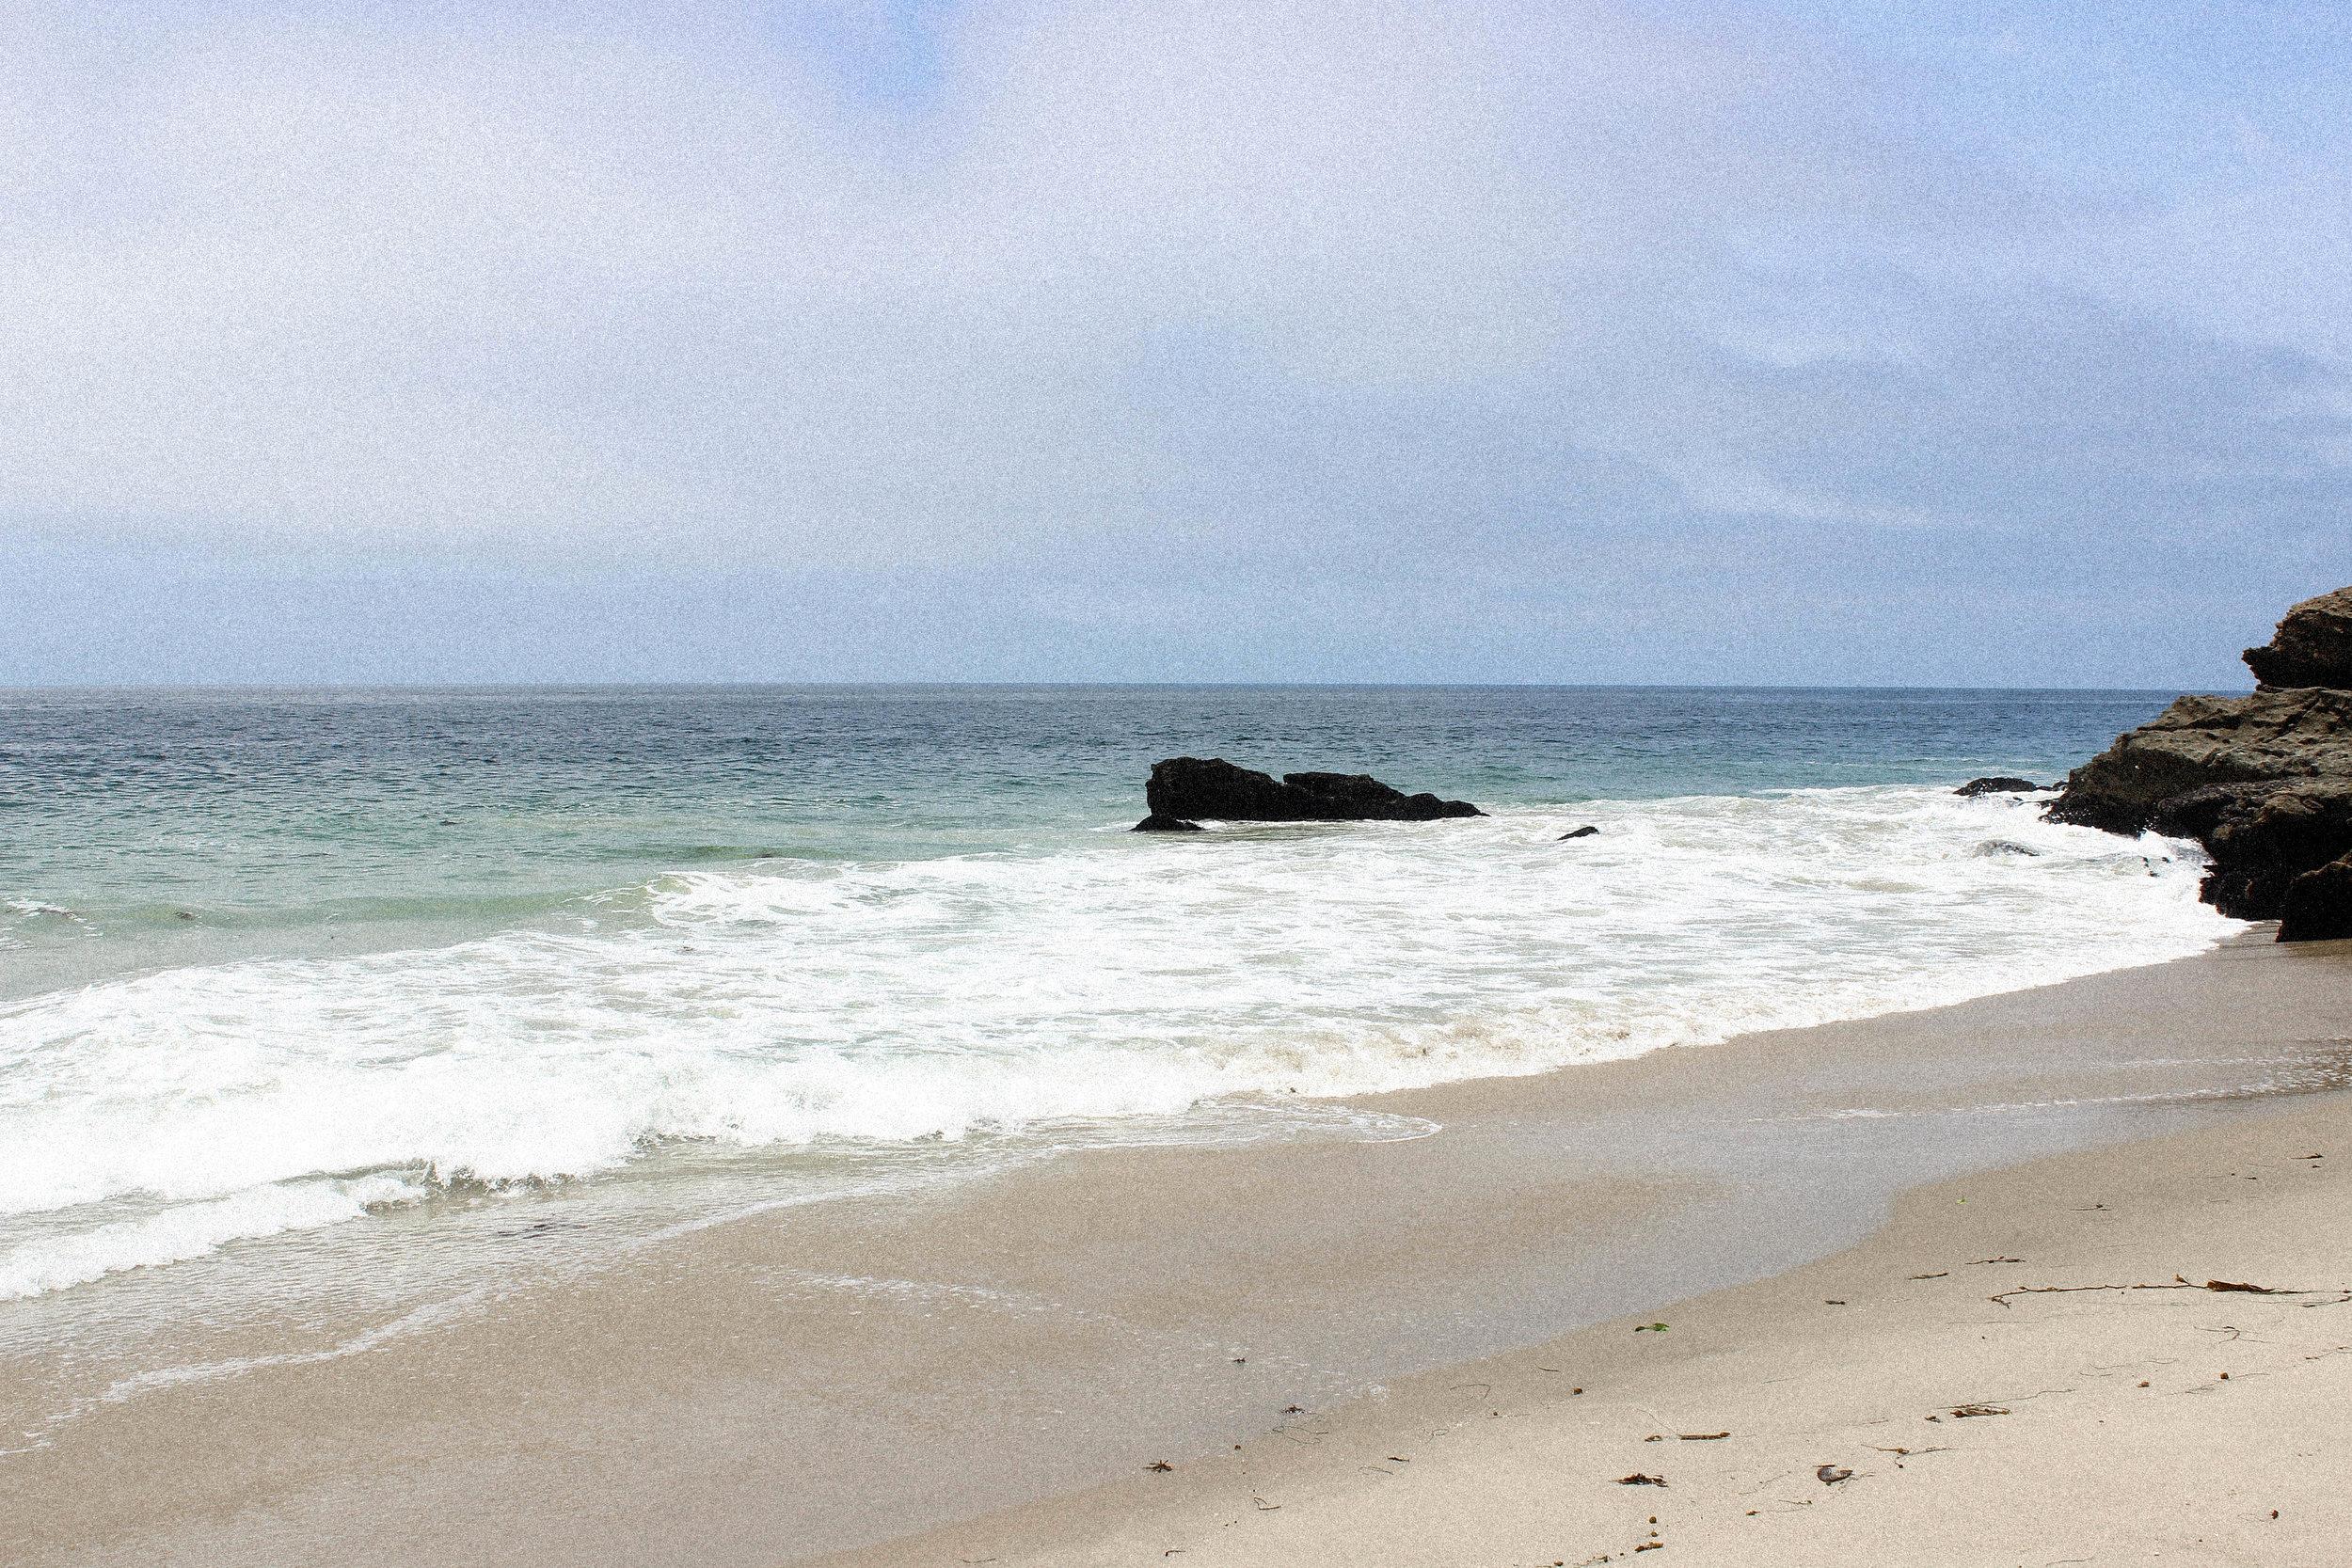 LAGUNA BEACH, CALIFORNIA - TAYLORKRISTIINA.COM